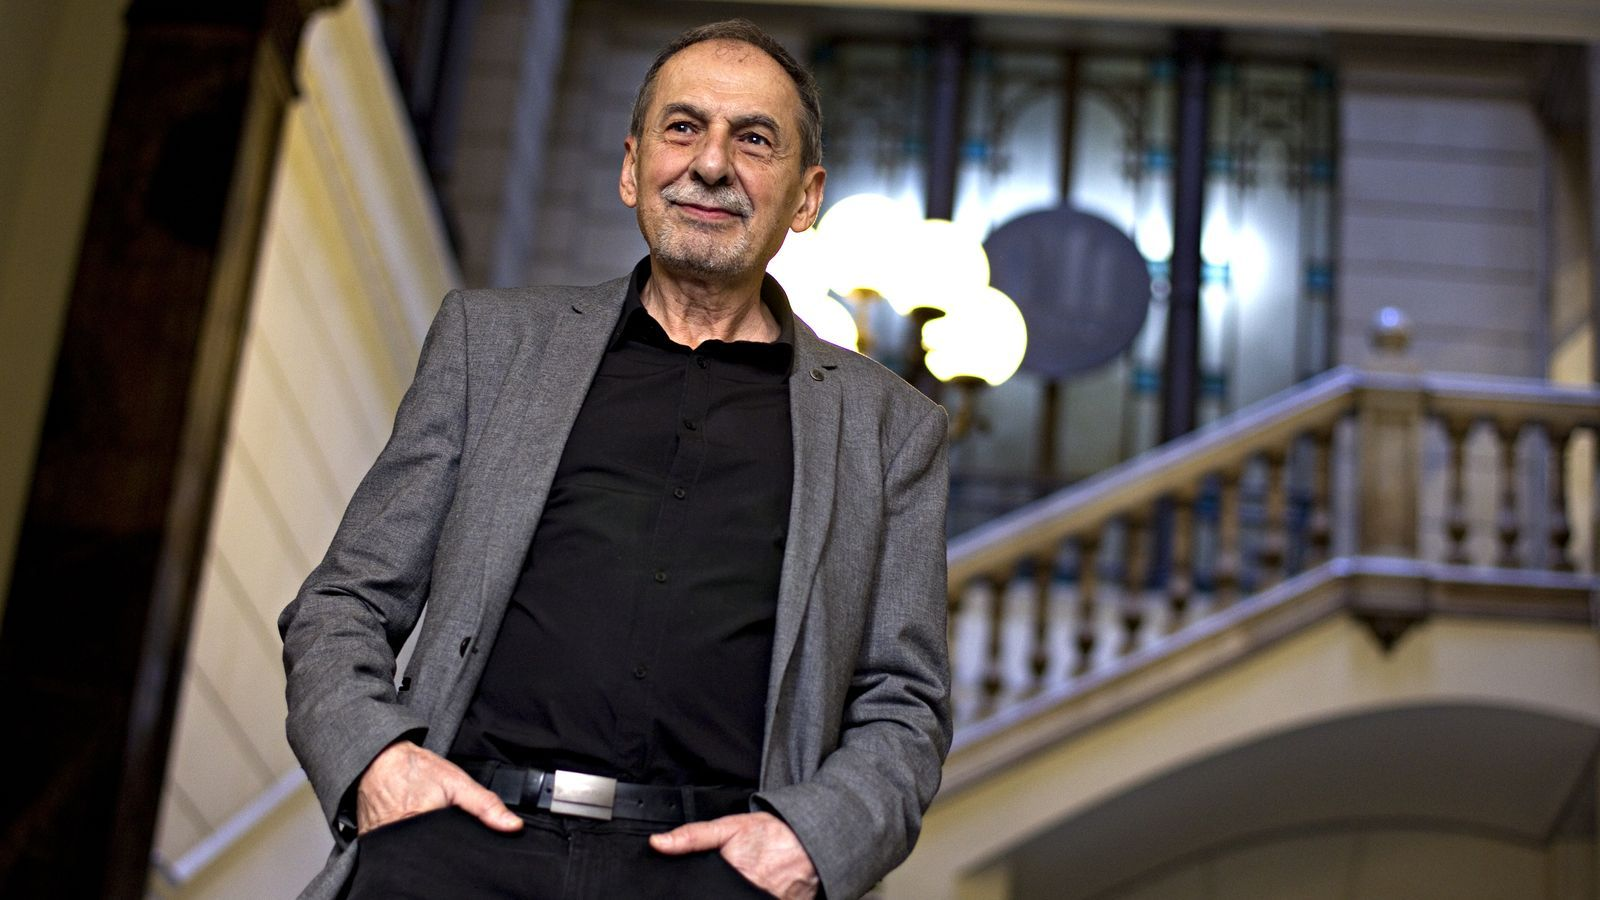 El dramaturg Josep Maria Benet i Jornet